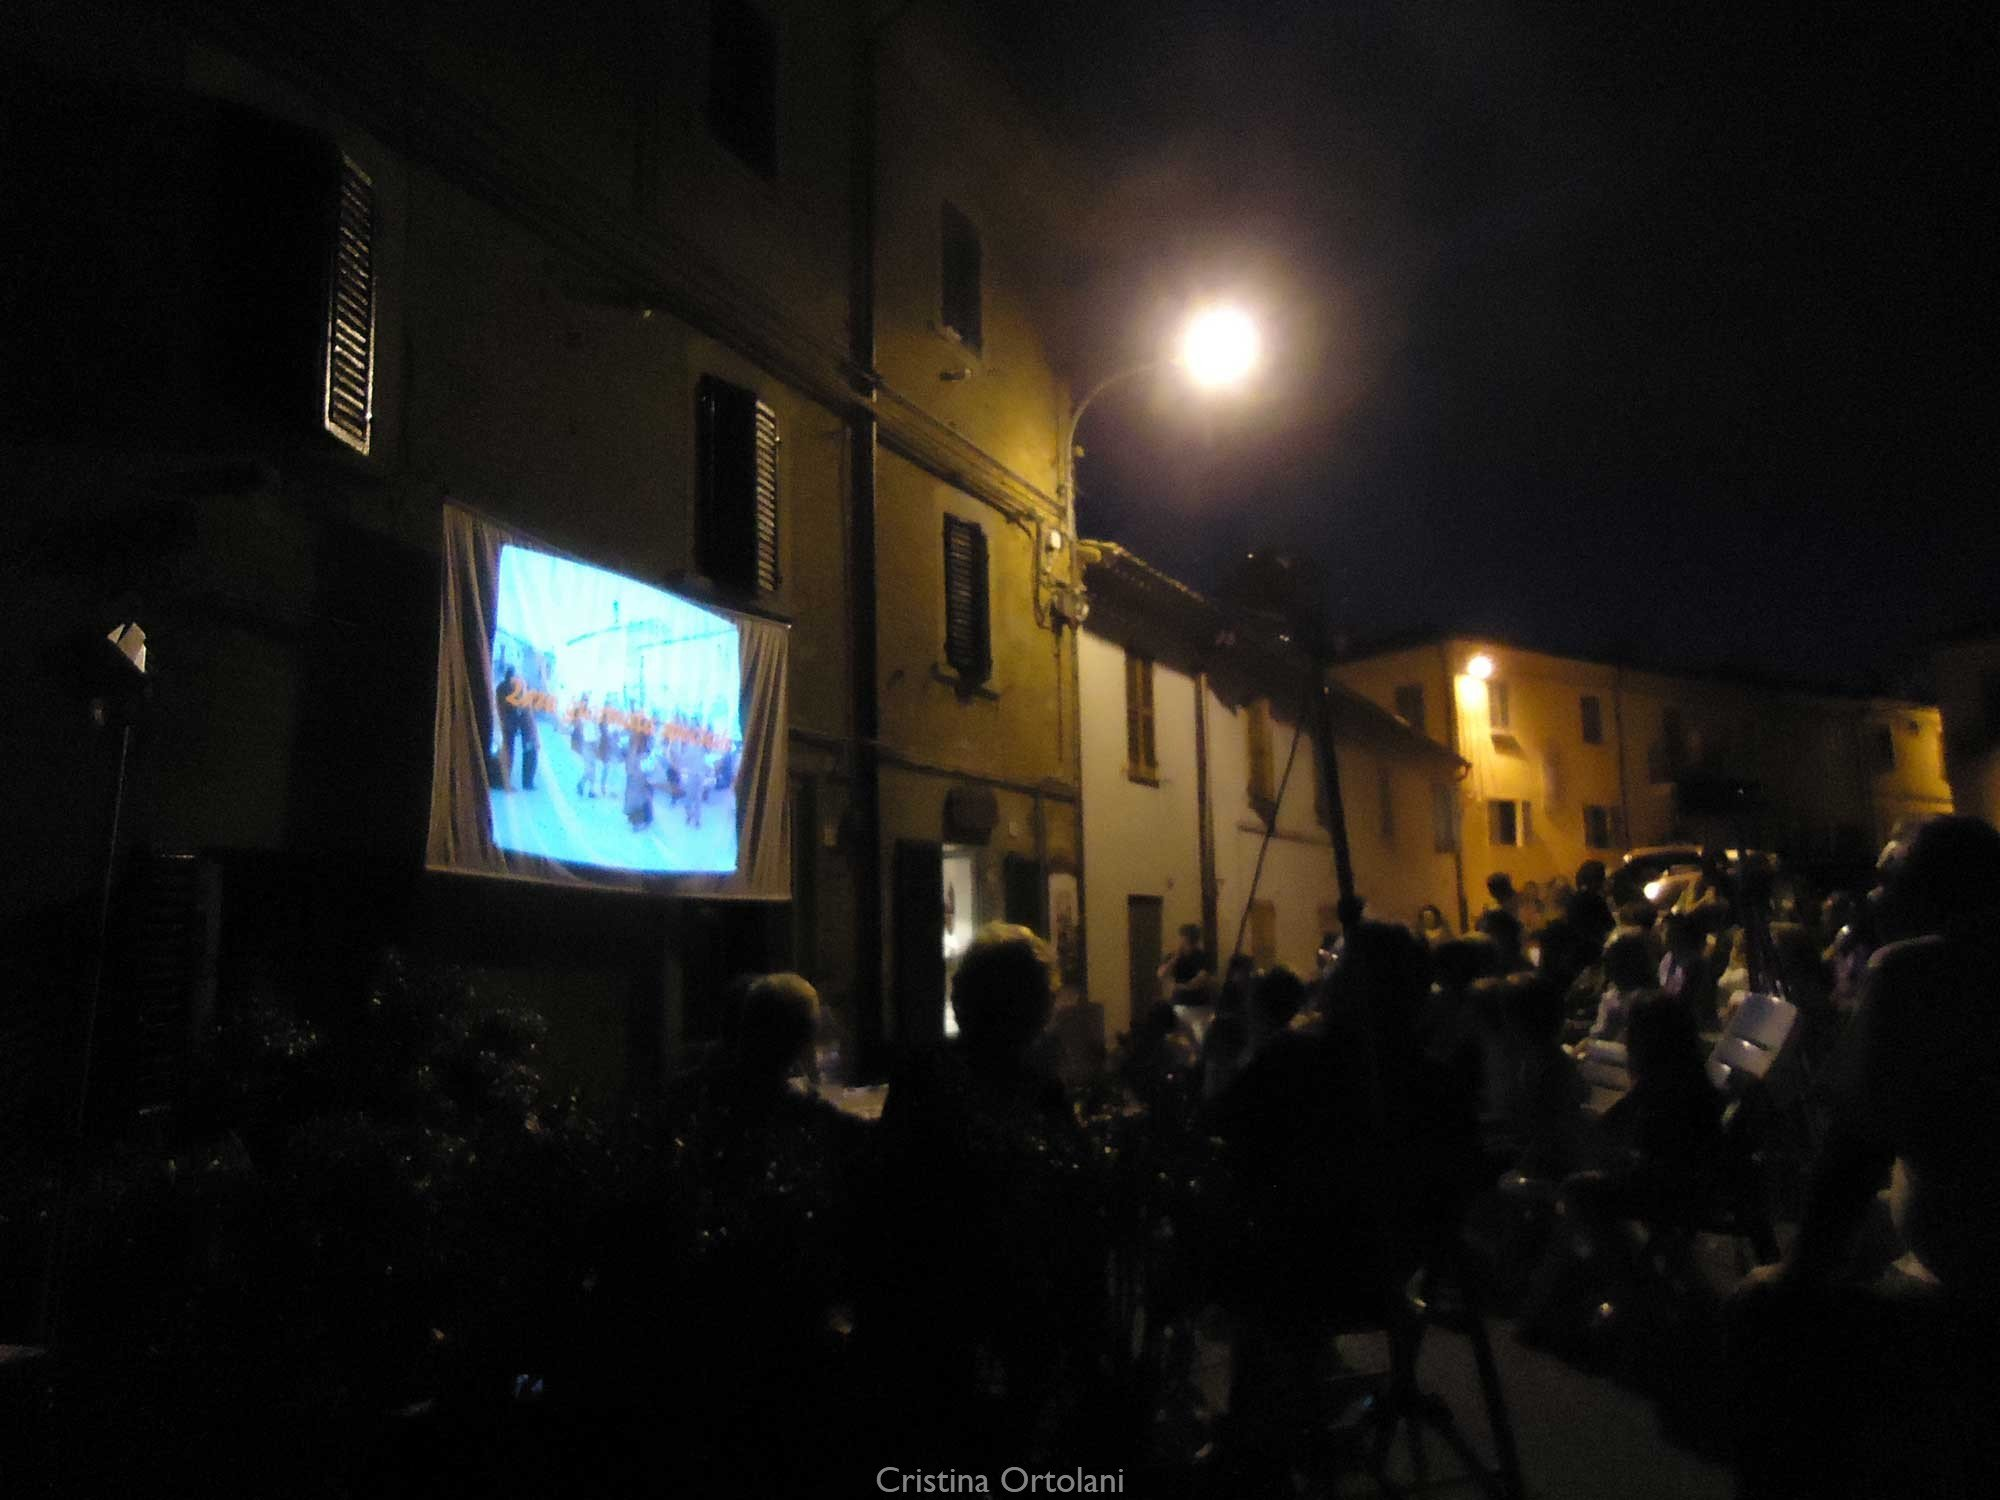 Pesaromemolab, Candelara, 28 giugno 2012